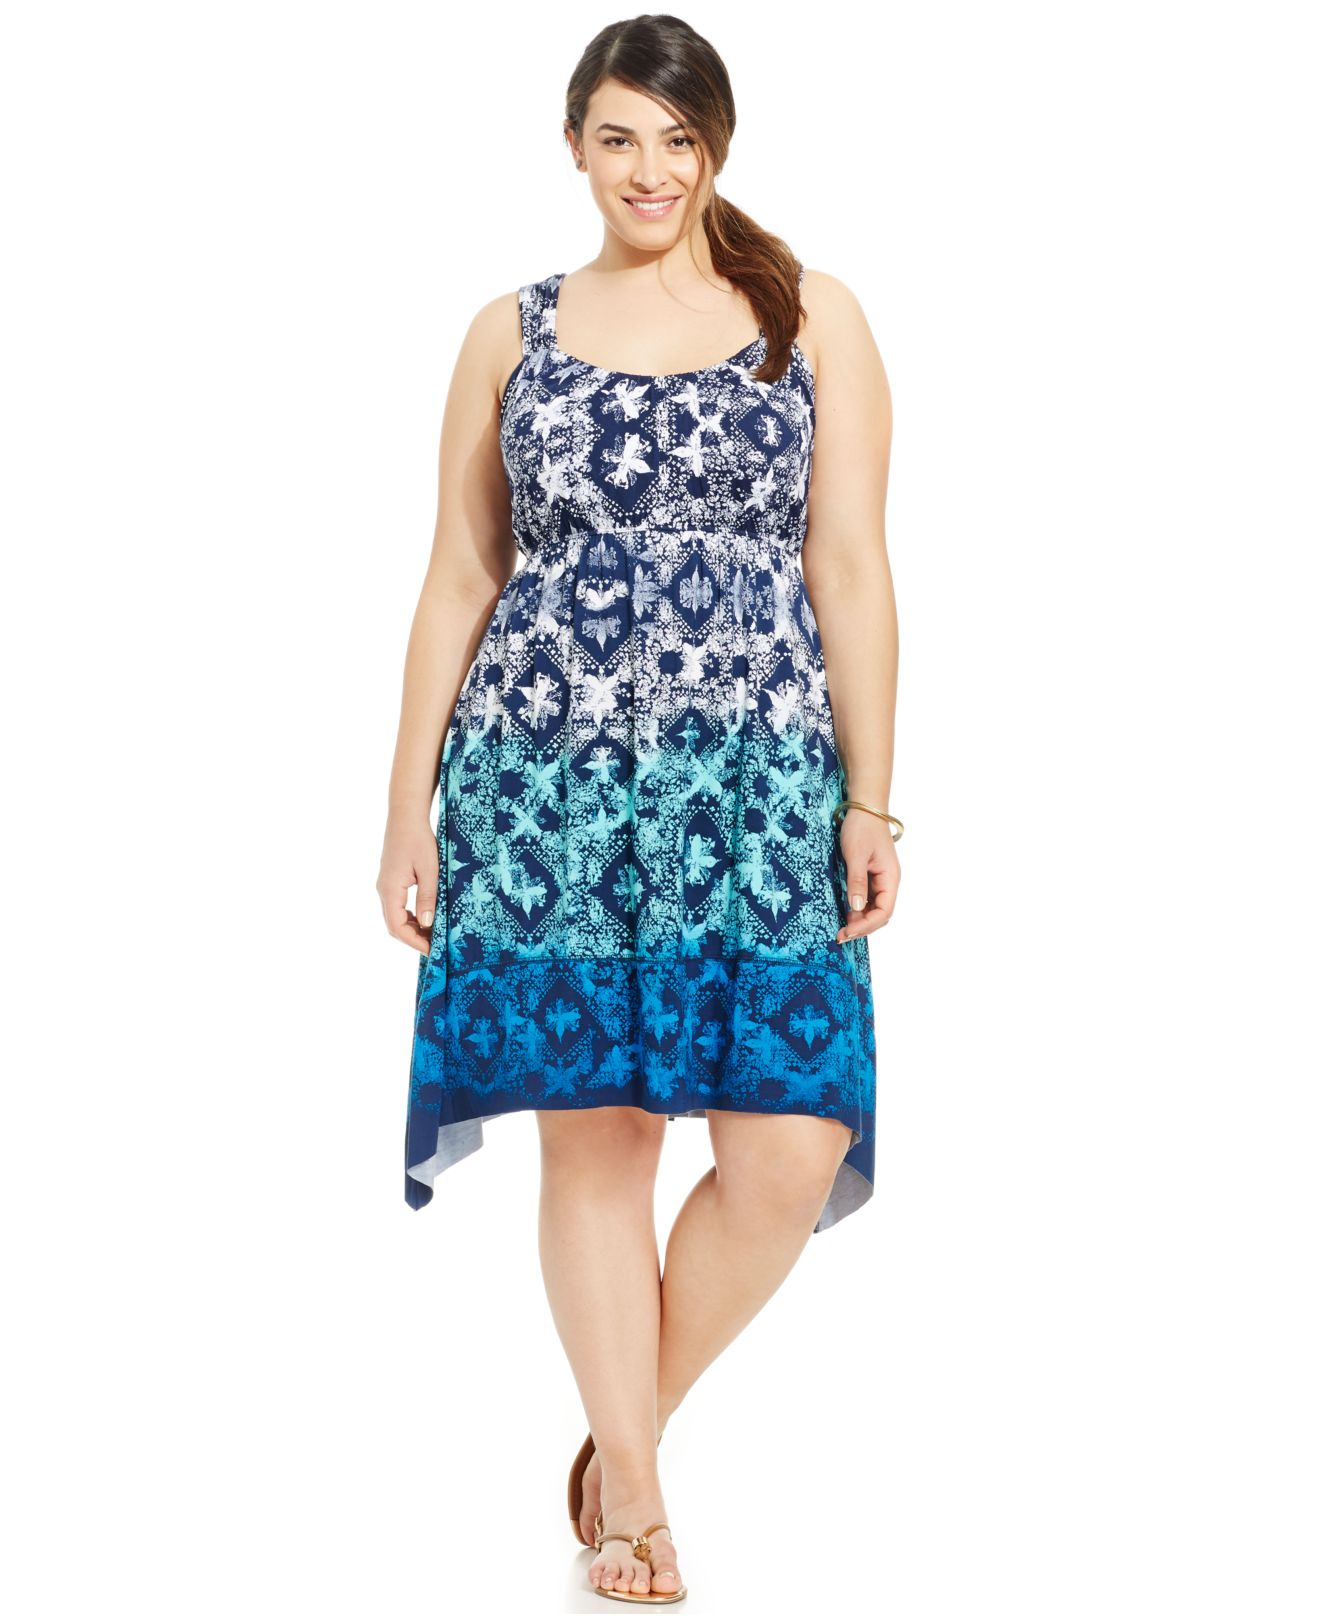 Handkerchief Hem Dresses In Plus Sizes Boulcom Dress Style 2018